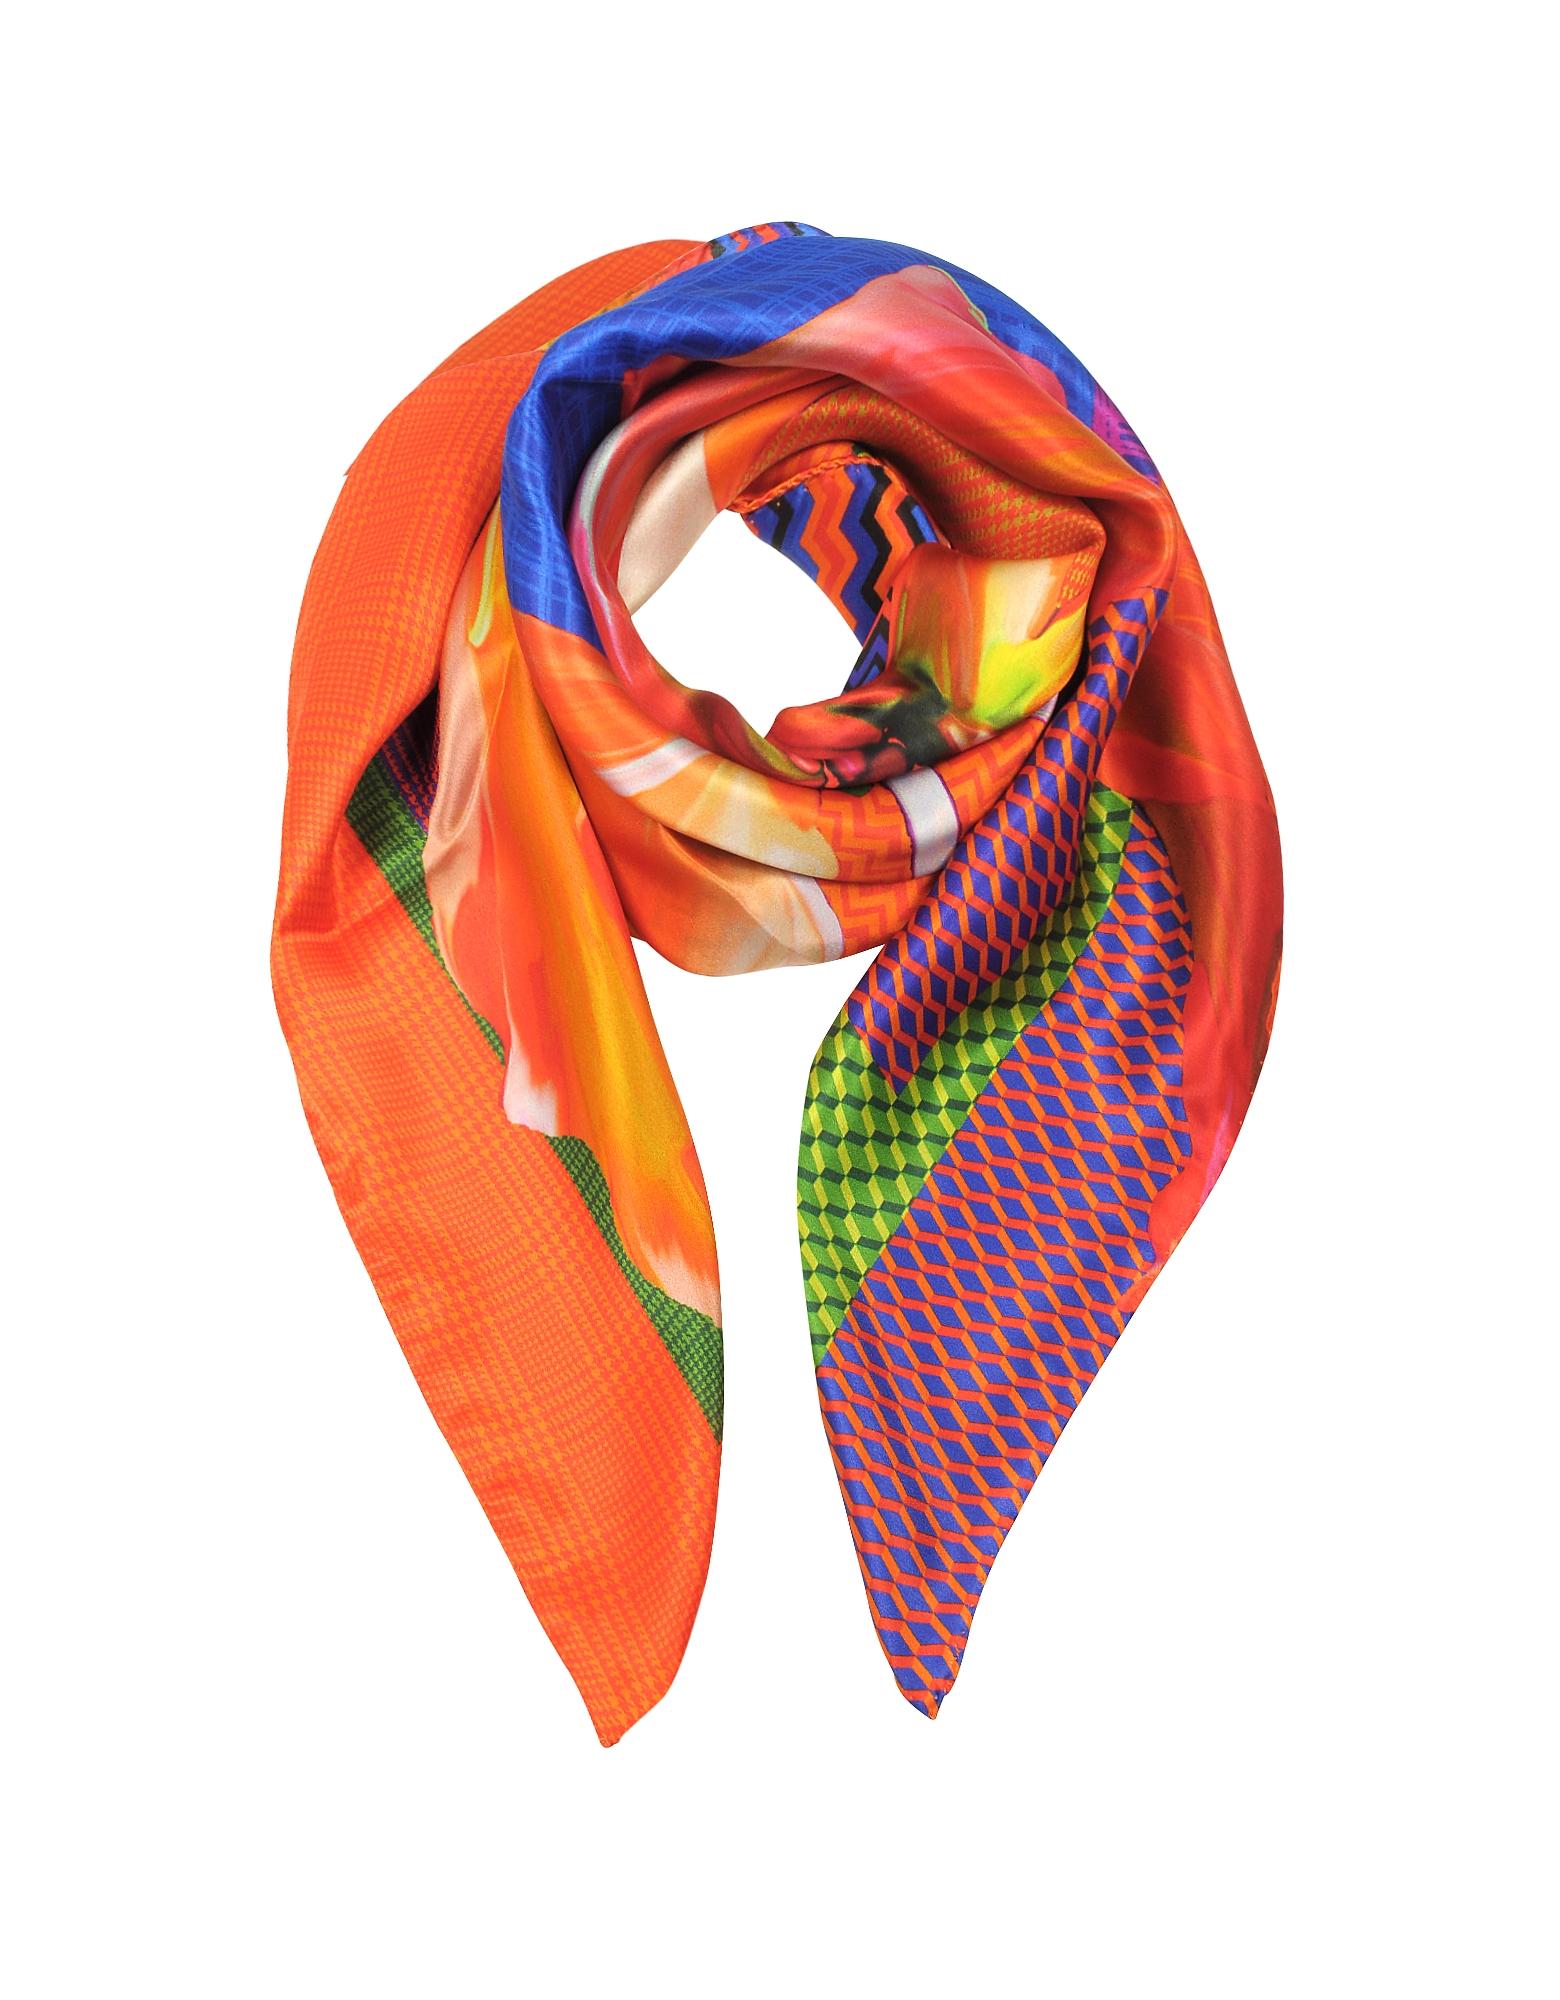 Zig-Zag and Flower Printed Twill Silk Square Scarf, Orange